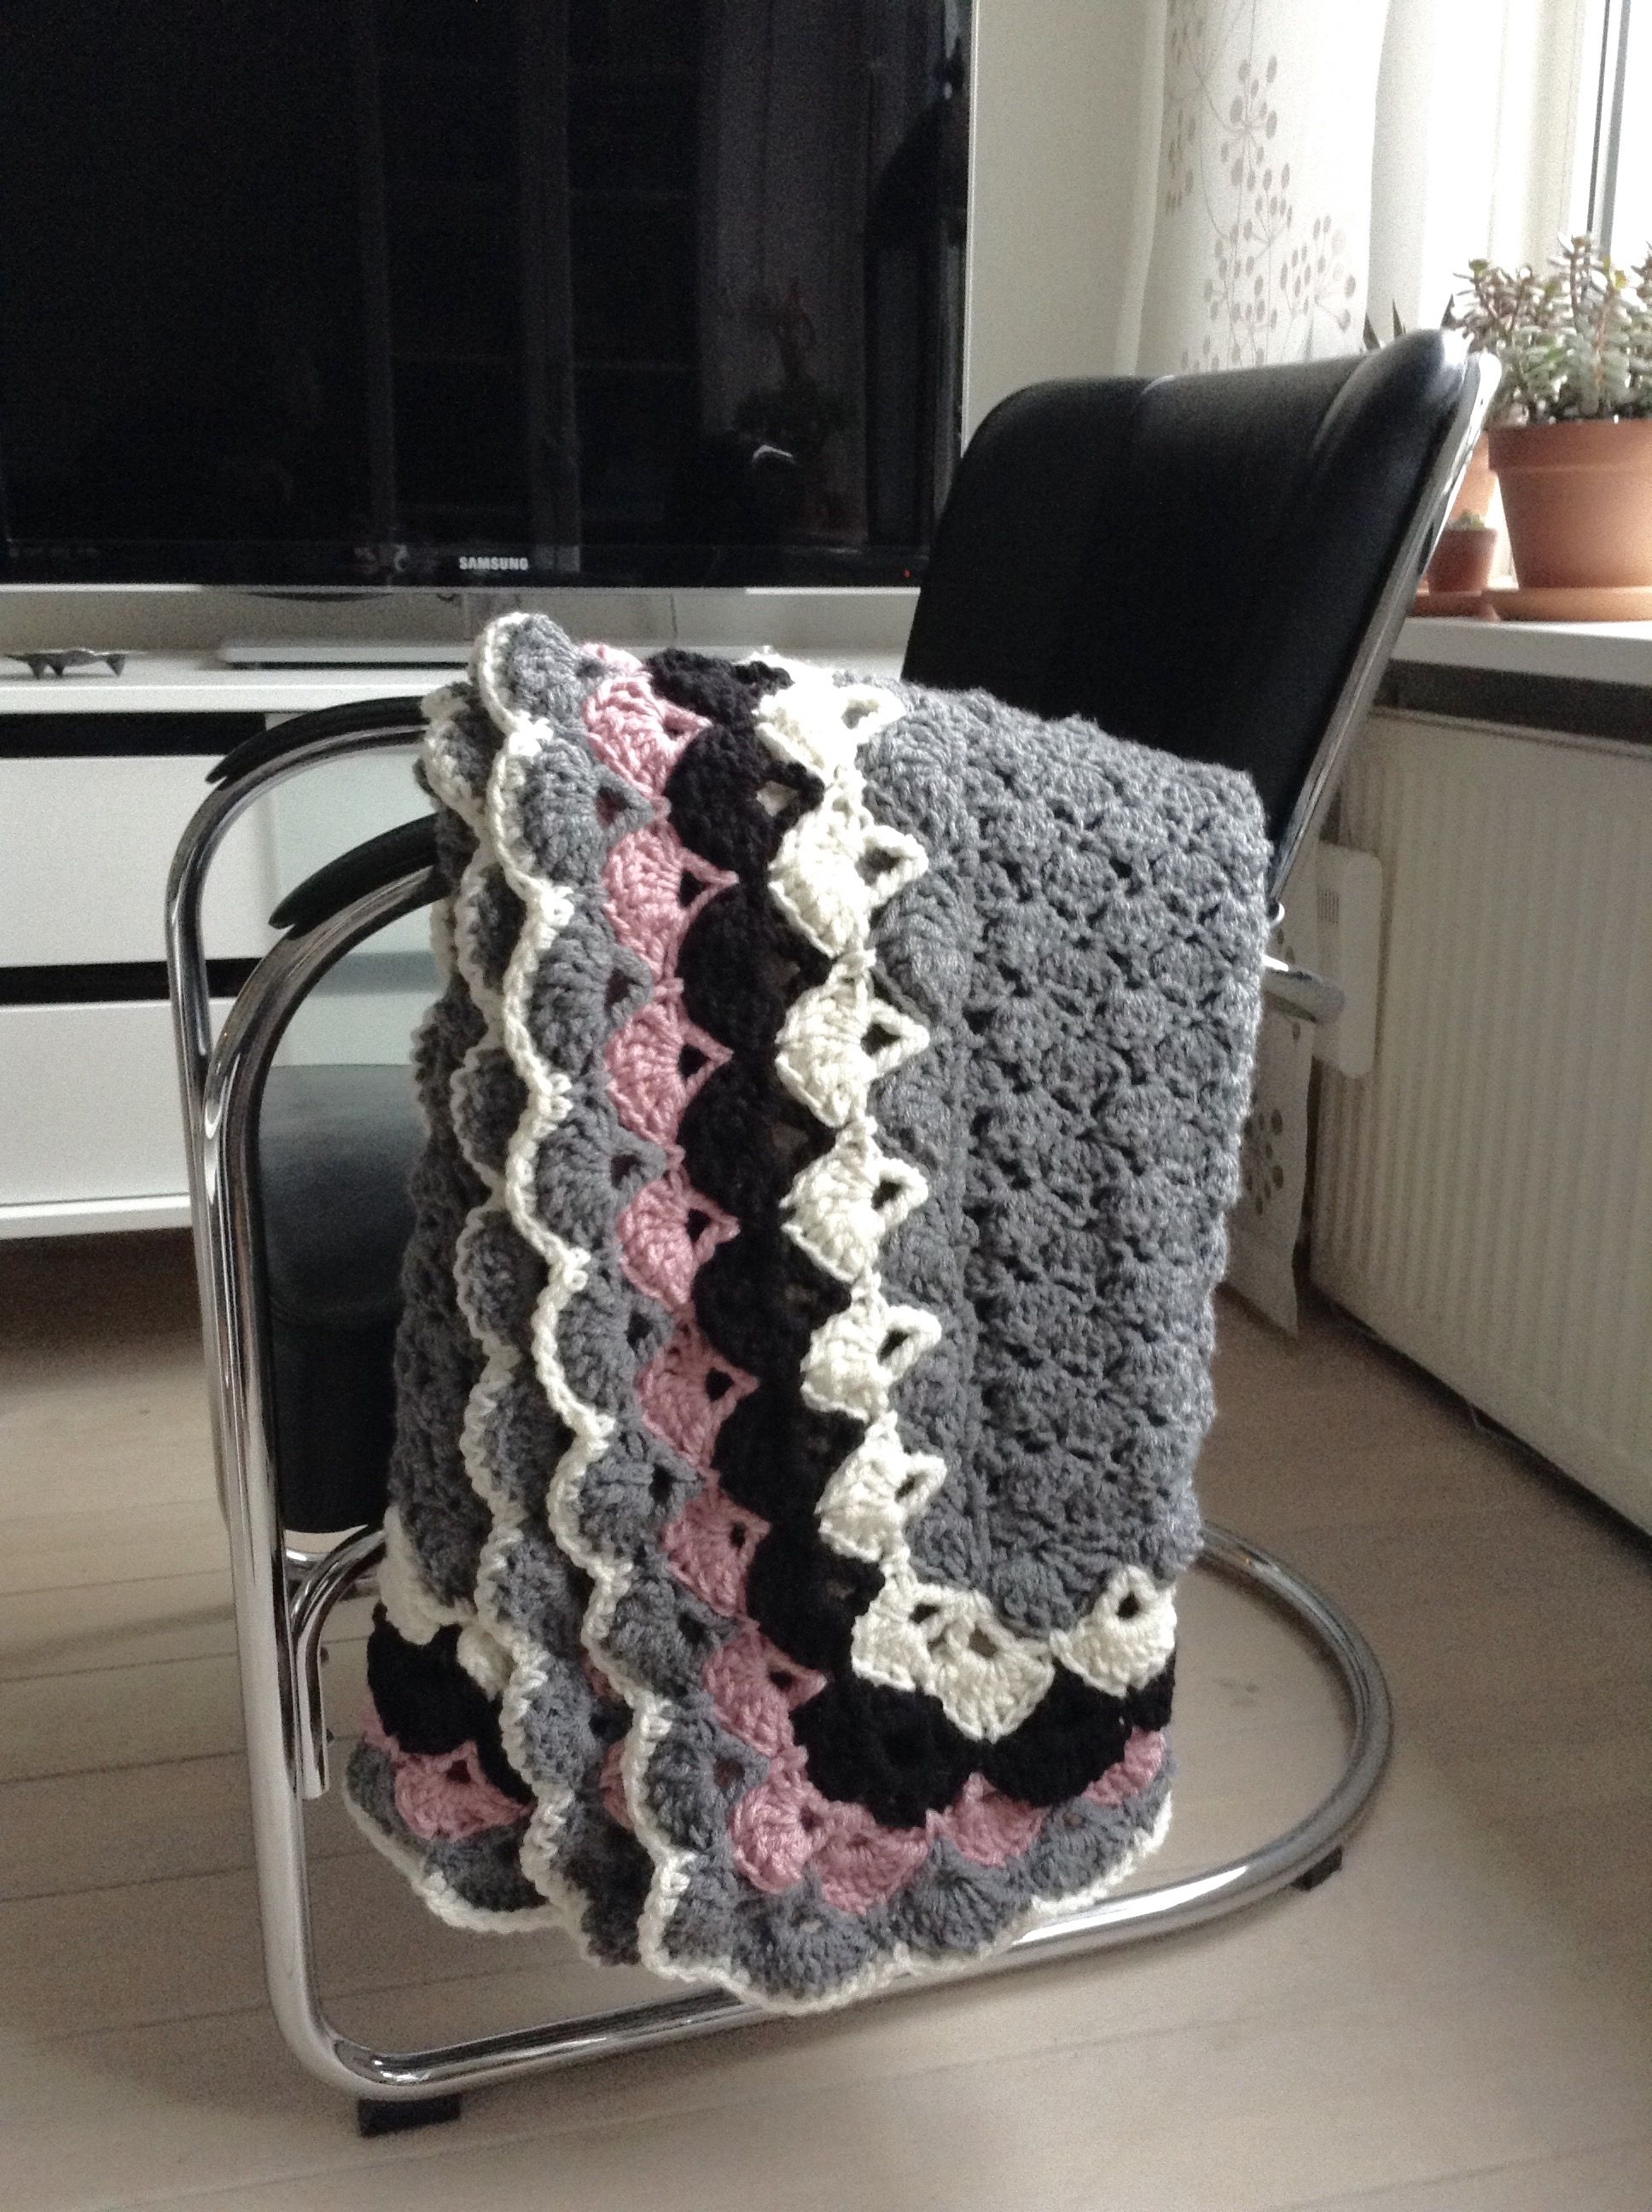 Large crochet shell stitch blanketafghan made with love for kiki large crochet shell stitch blanketafghan made with love for kiki dt1010fo